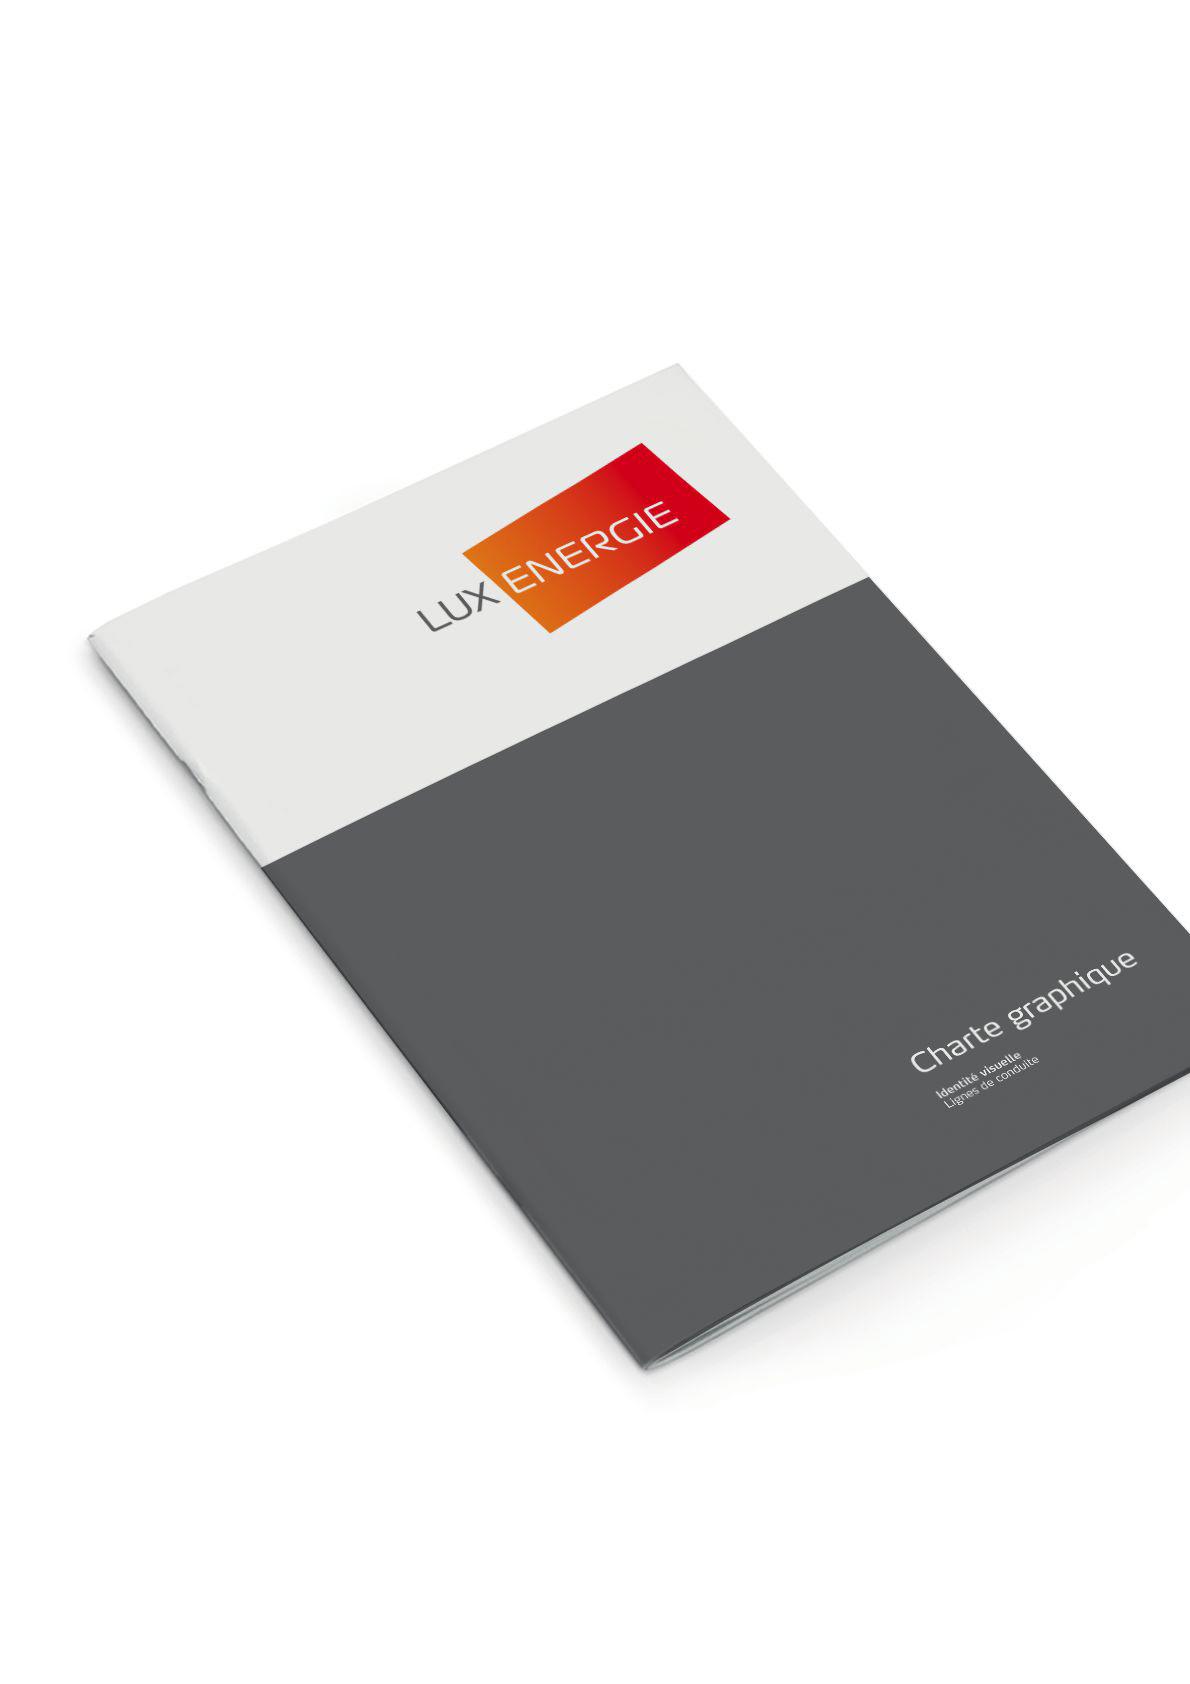 Binsfeld_creation_Luxenergie_CI_Manual_HOME 2